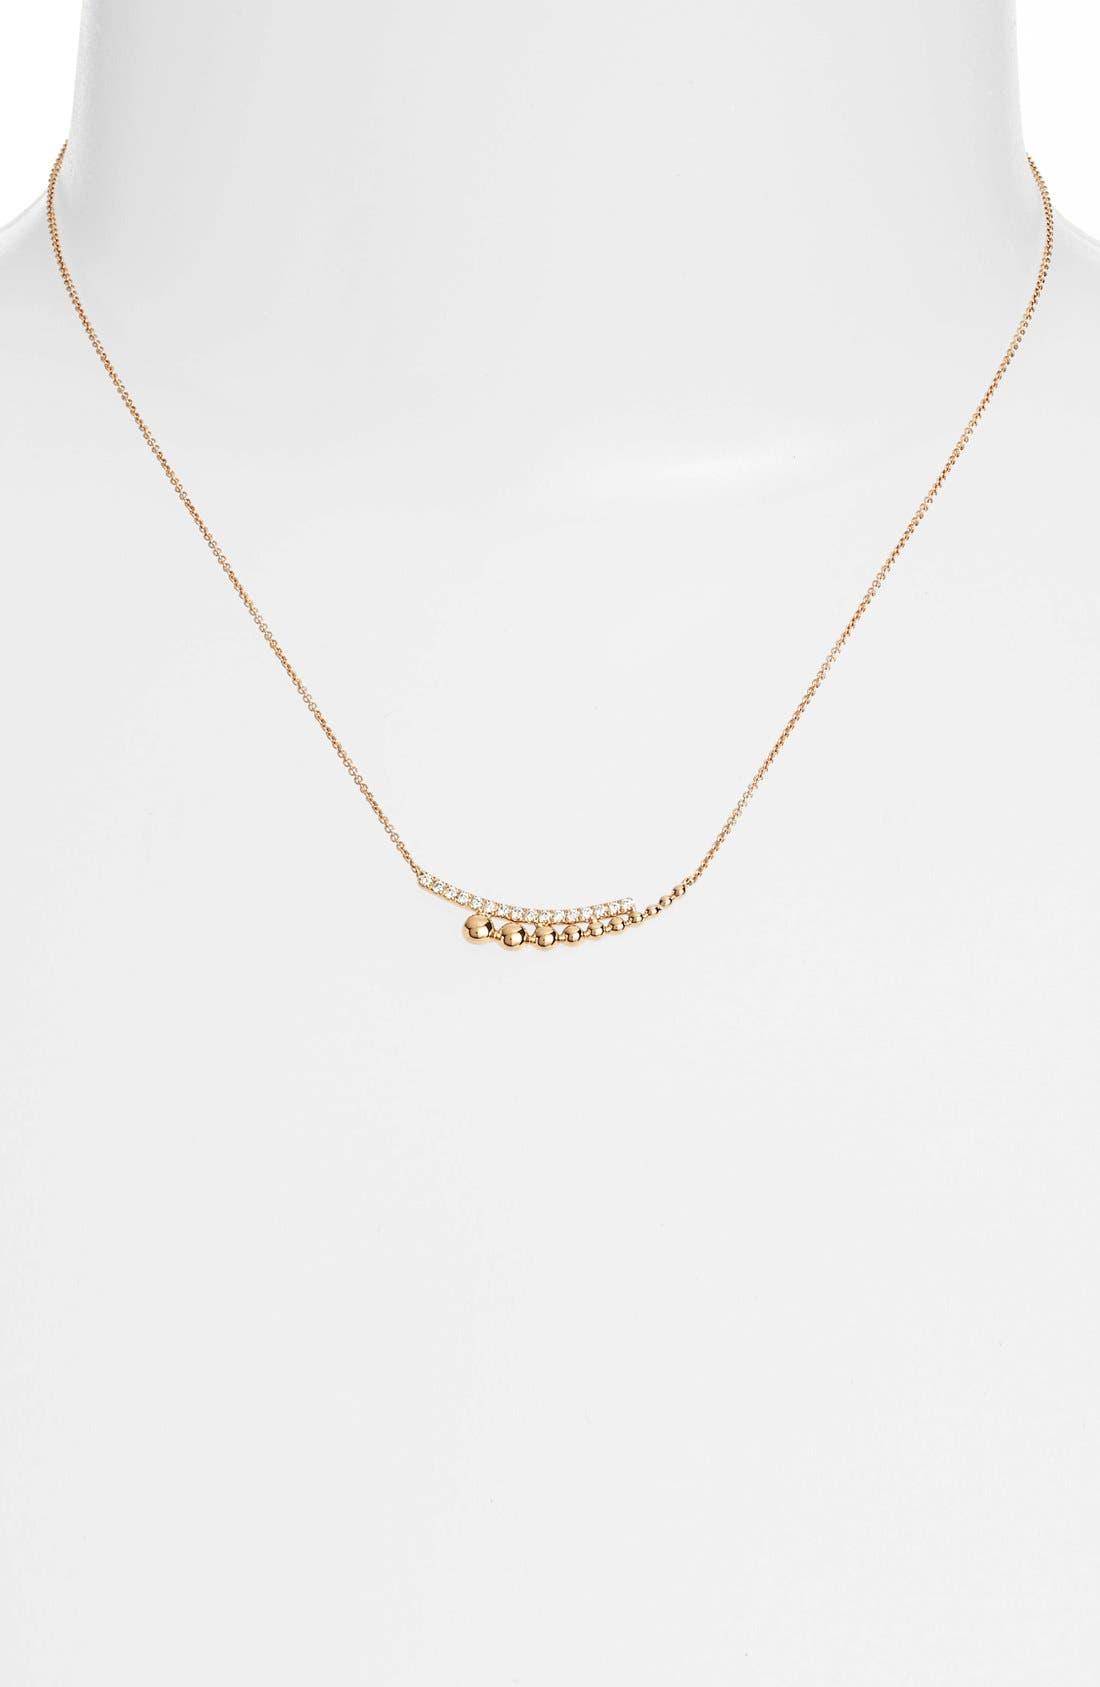 Poppy Rae Diamond Pendant Necklace,                             Alternate thumbnail 2, color,